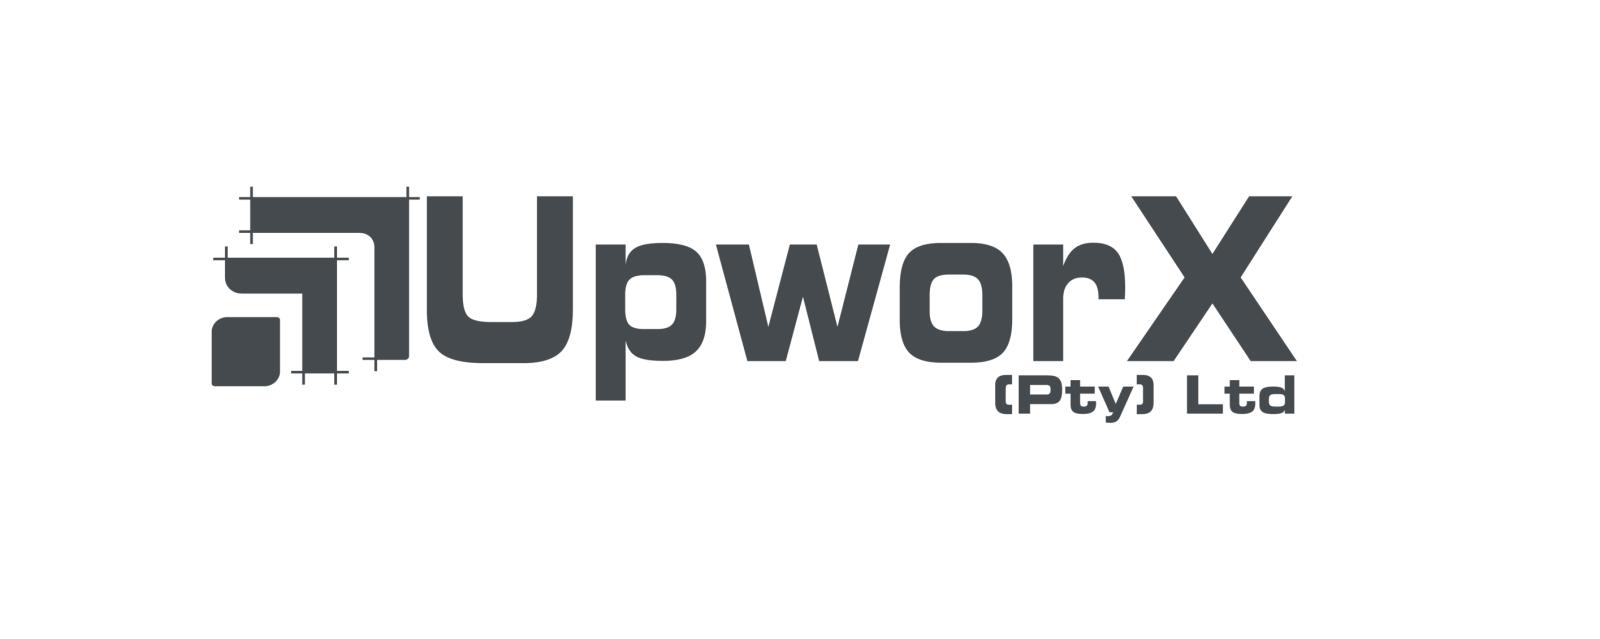 new client logos (1)